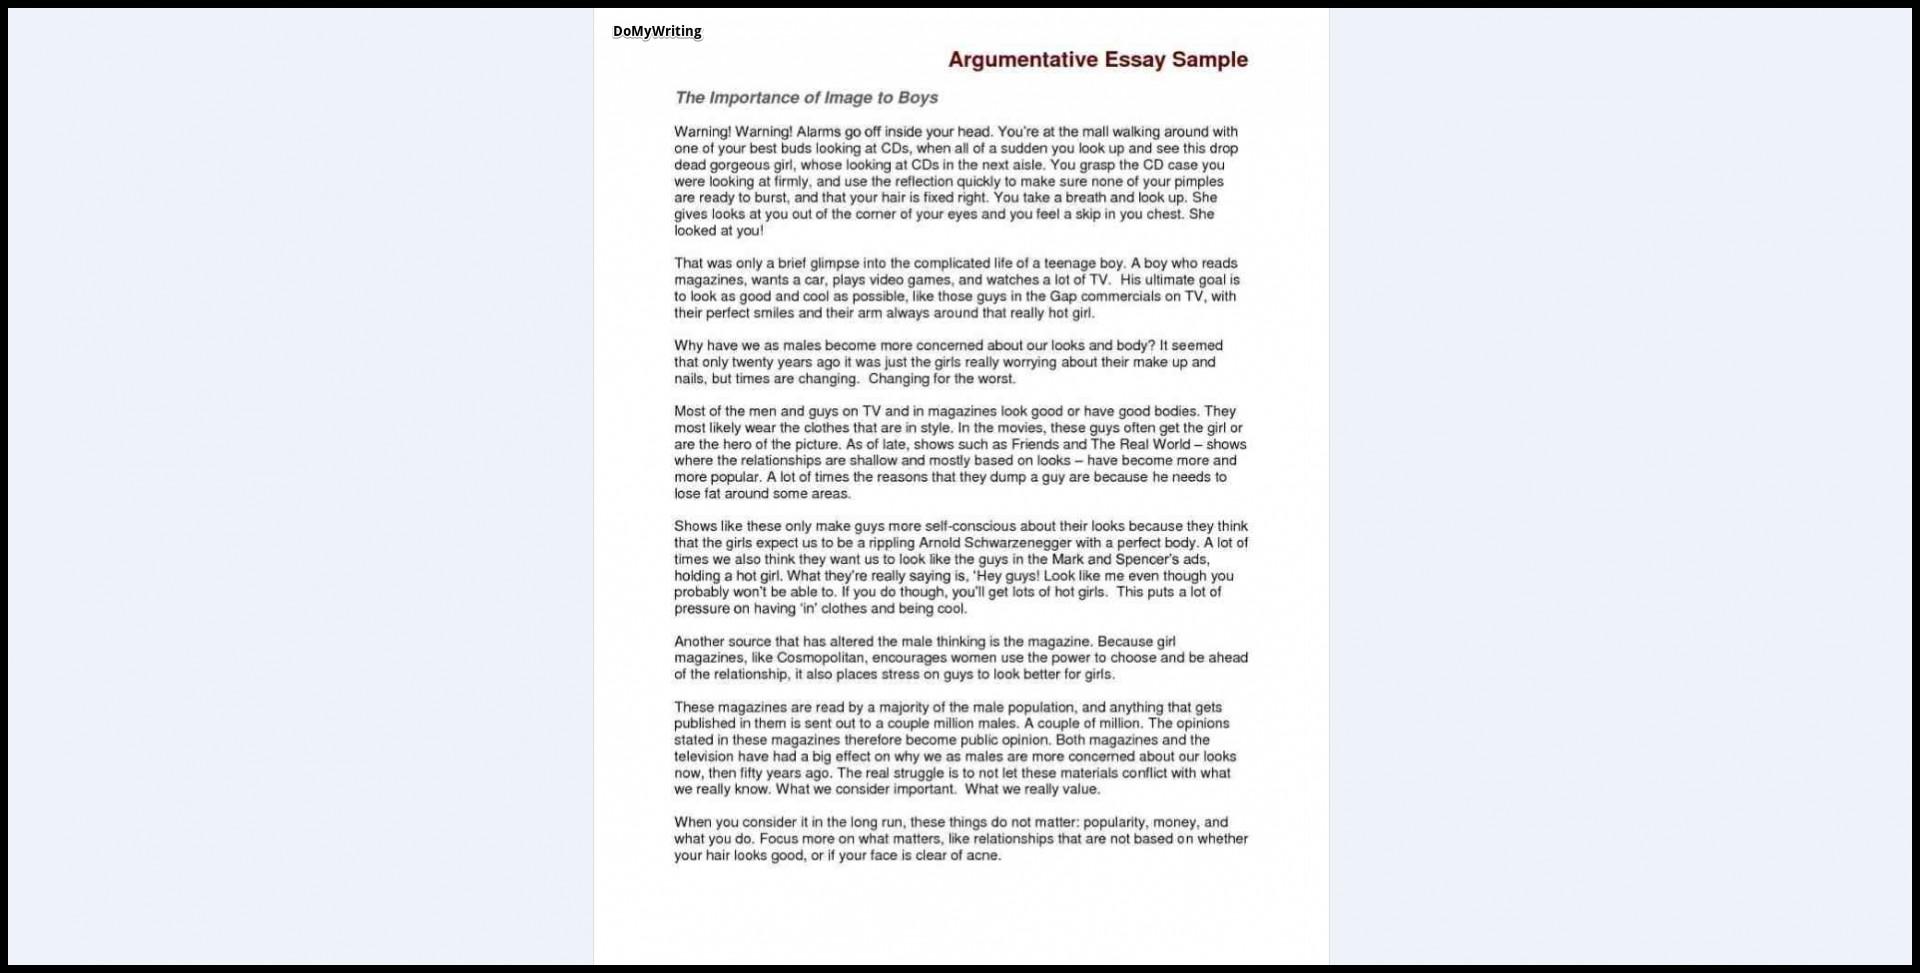 005 Argumentative Essay Sample Good Topics For Discursive Wonderful A National 5 Interesting Persuasive 1920